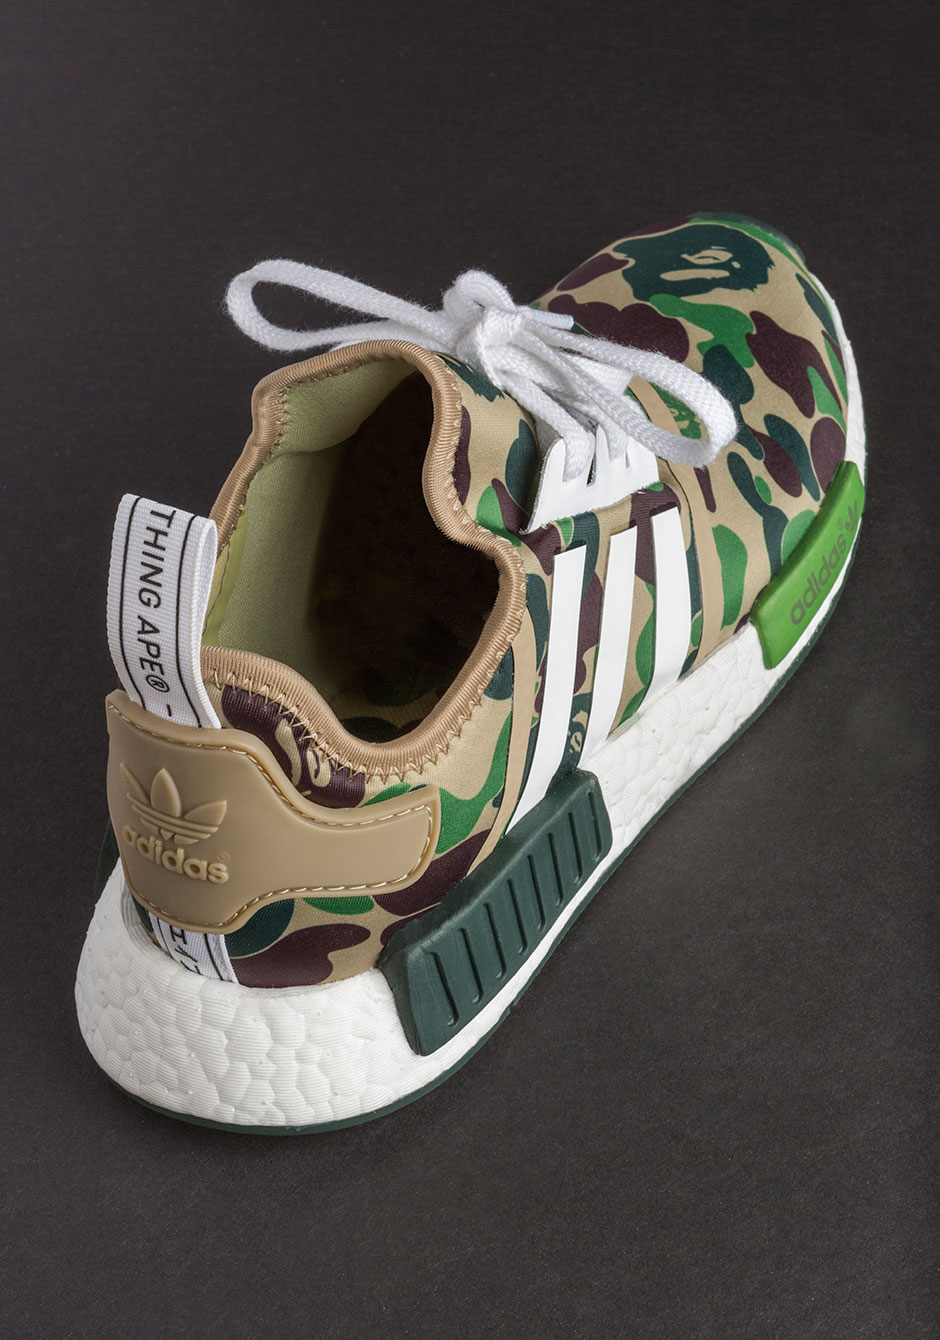 BAPE x adidas NMD R1 细节图 资讯 AJ23 Air Jordan Sneaker